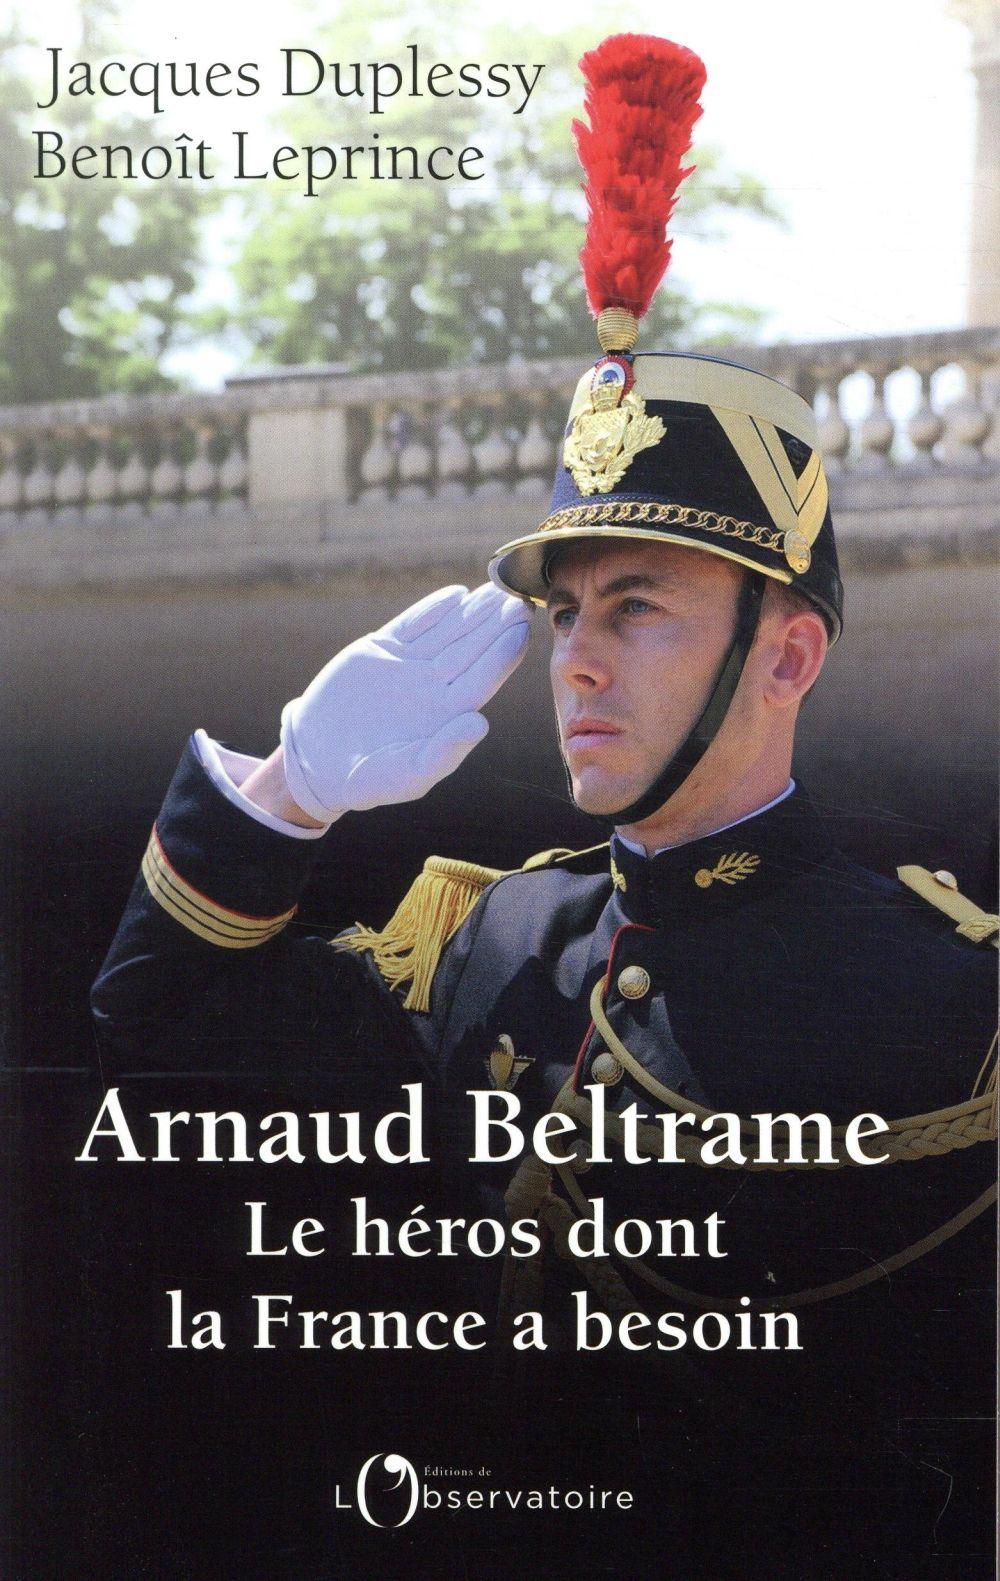 ARNAUD BELTRAME LE HEROS DONT LA FRANCE A BESOIN